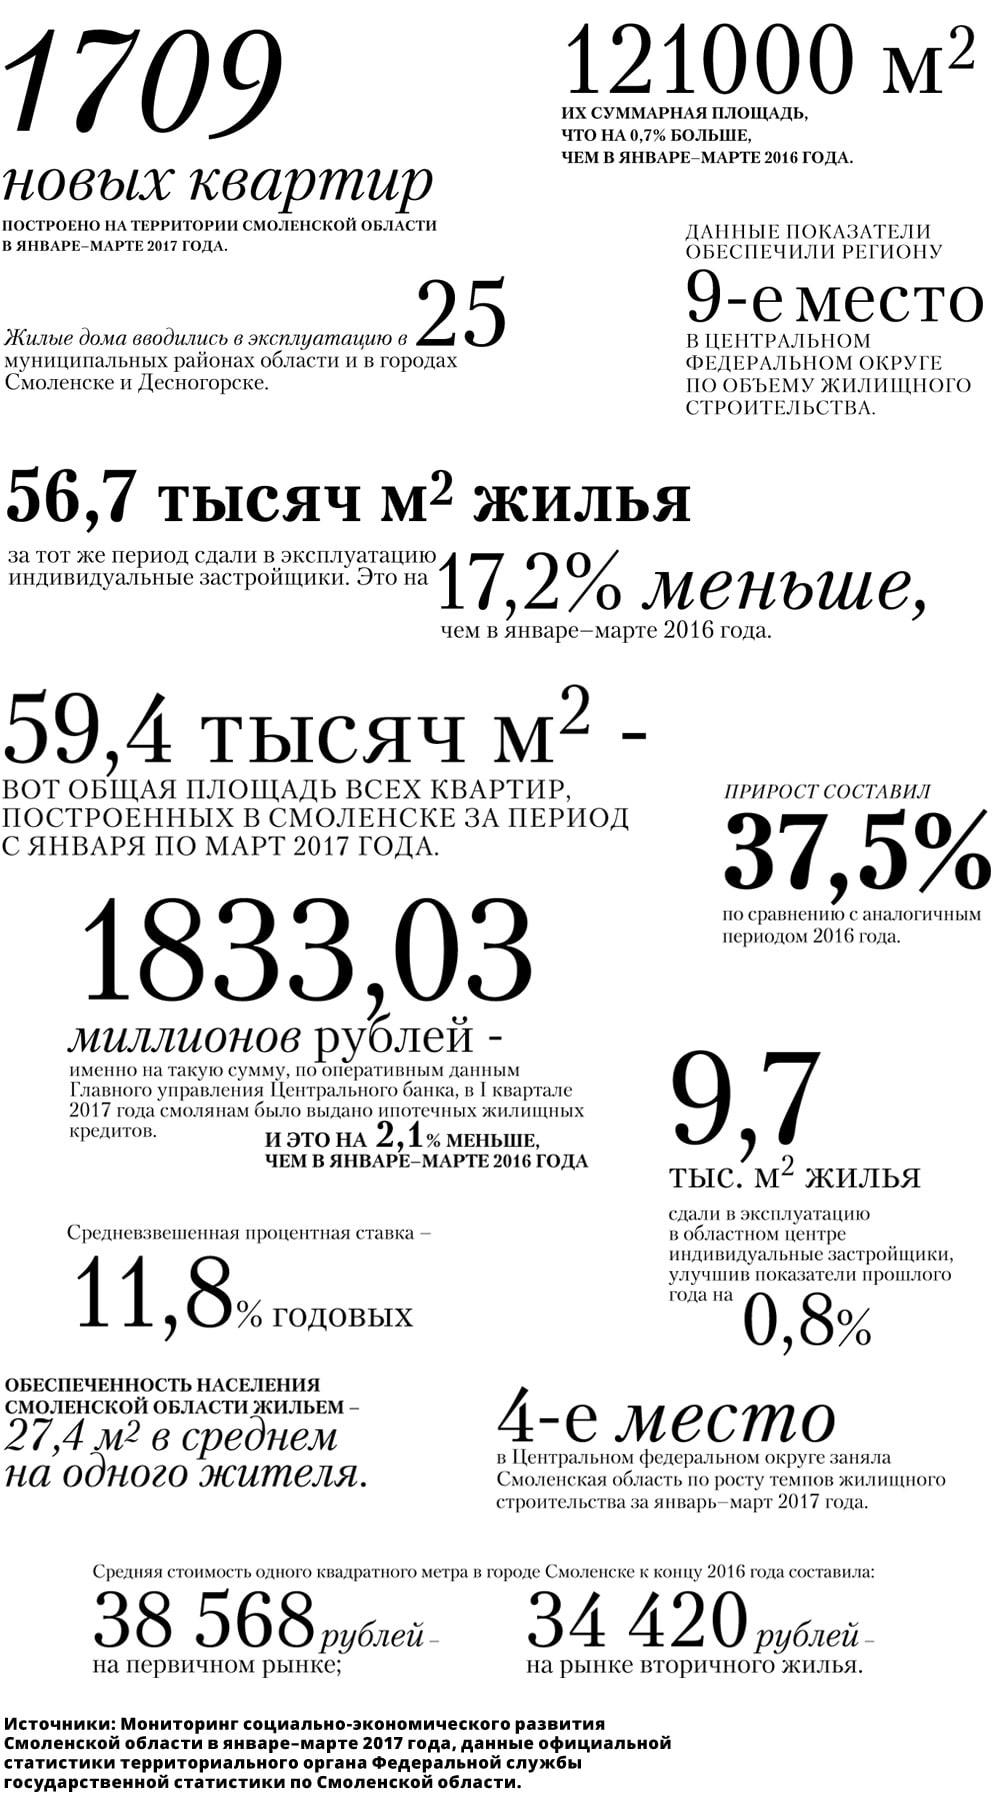 infografika-stroika_september2017_1000x1800-min